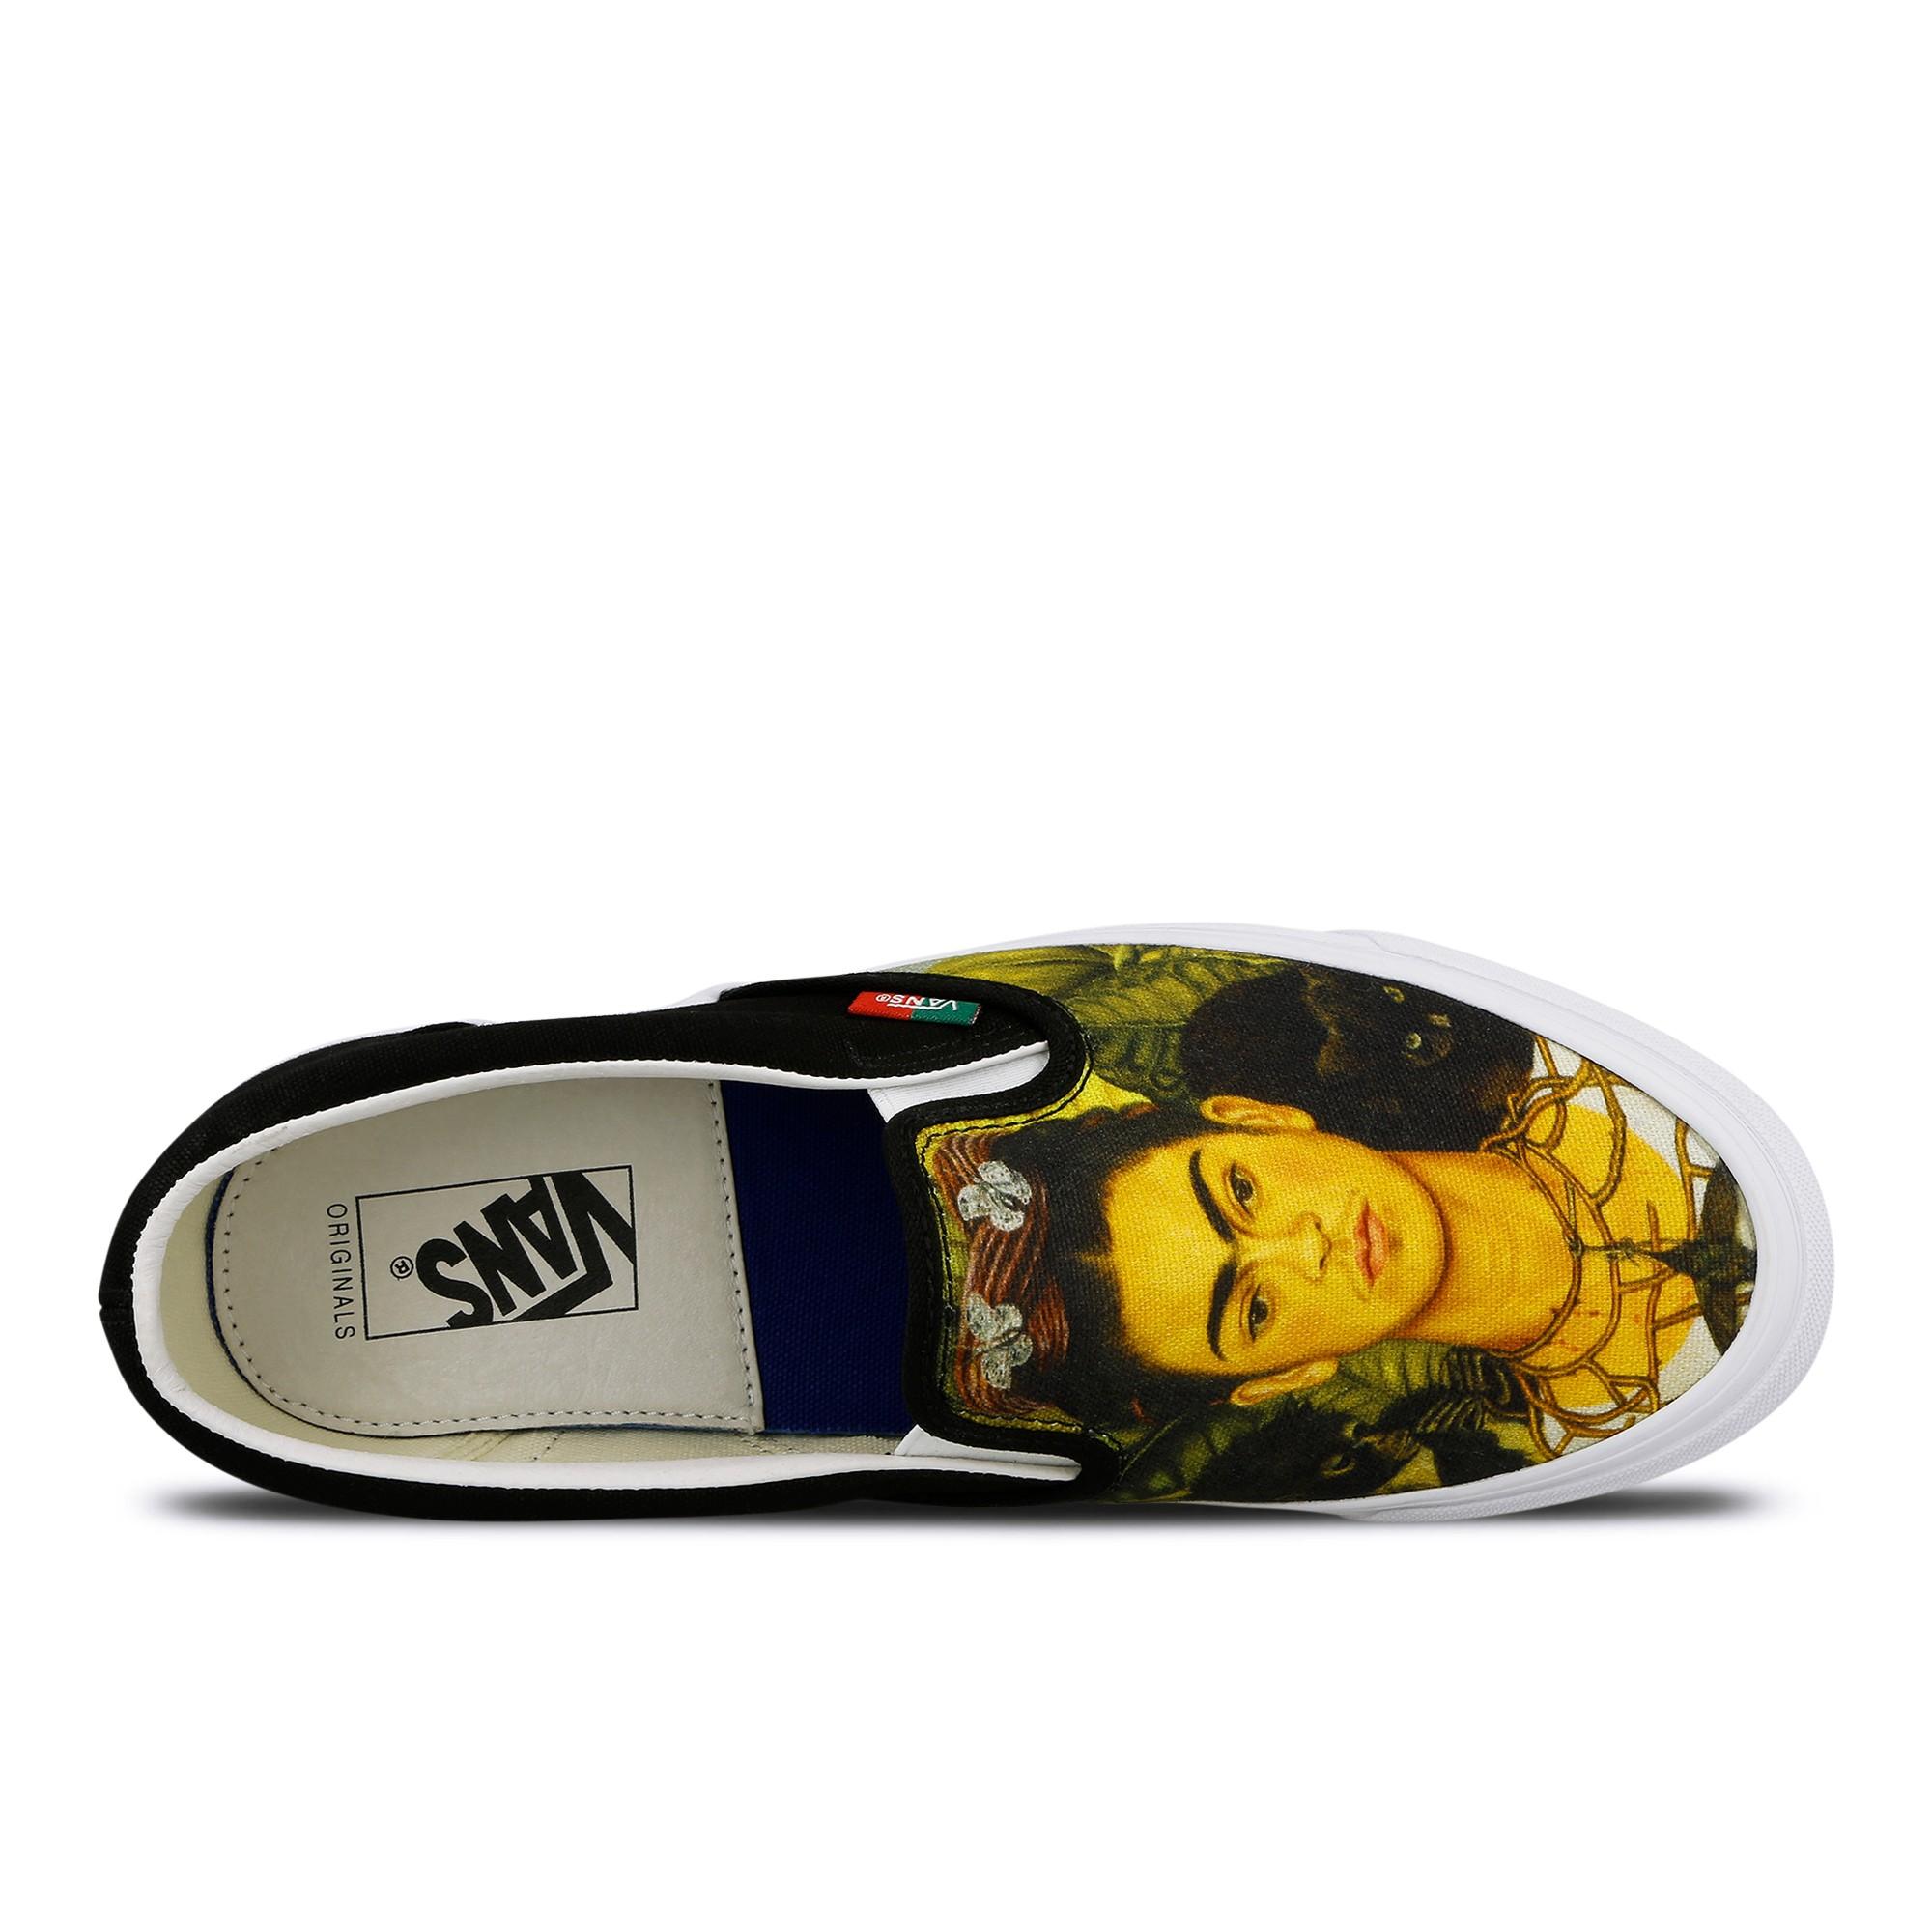 Vans OVERKILL Berlin Sneaker, Wear & Graffiti